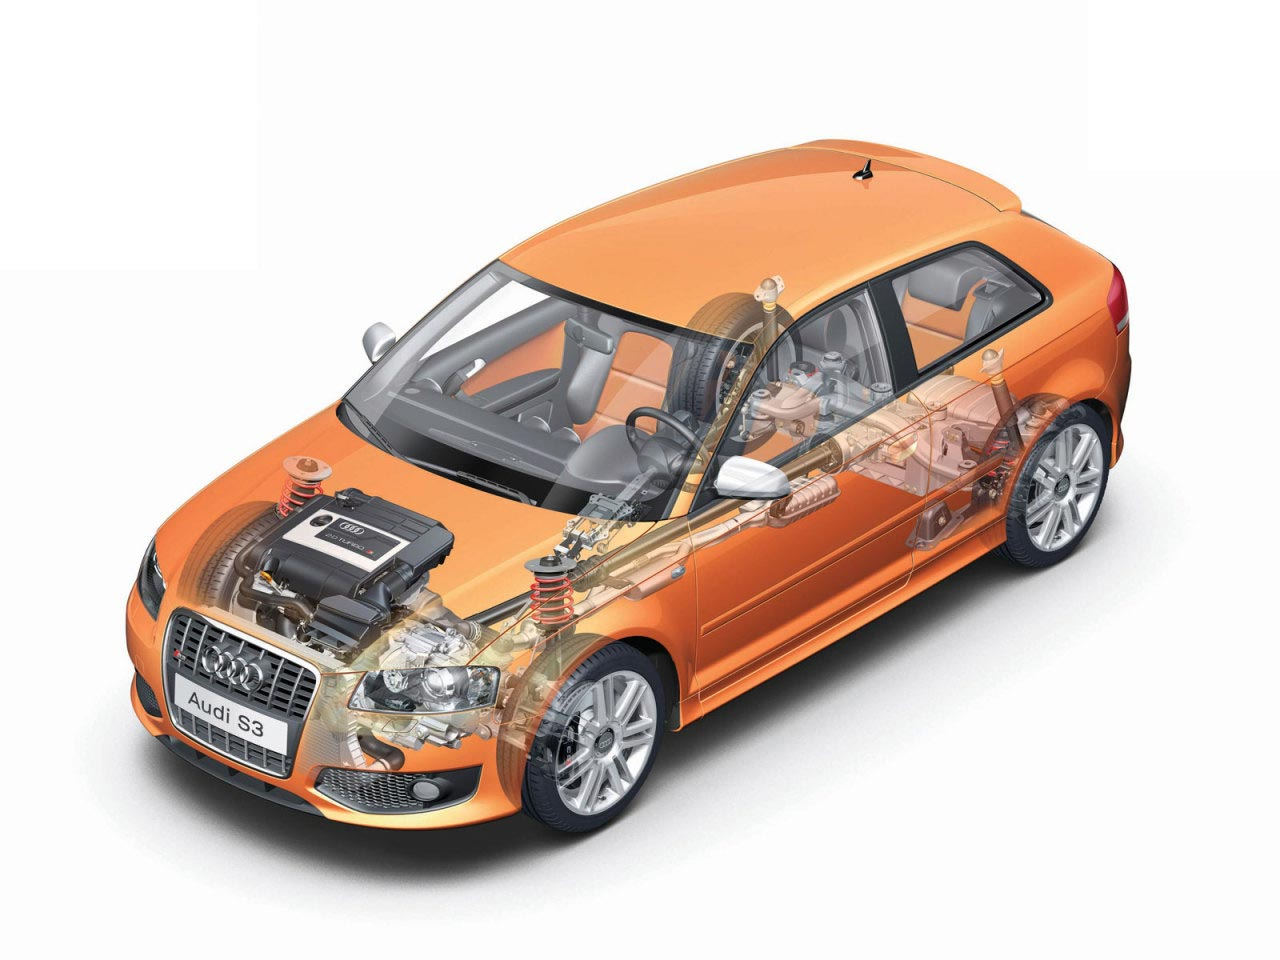 Audi s3 cutaway